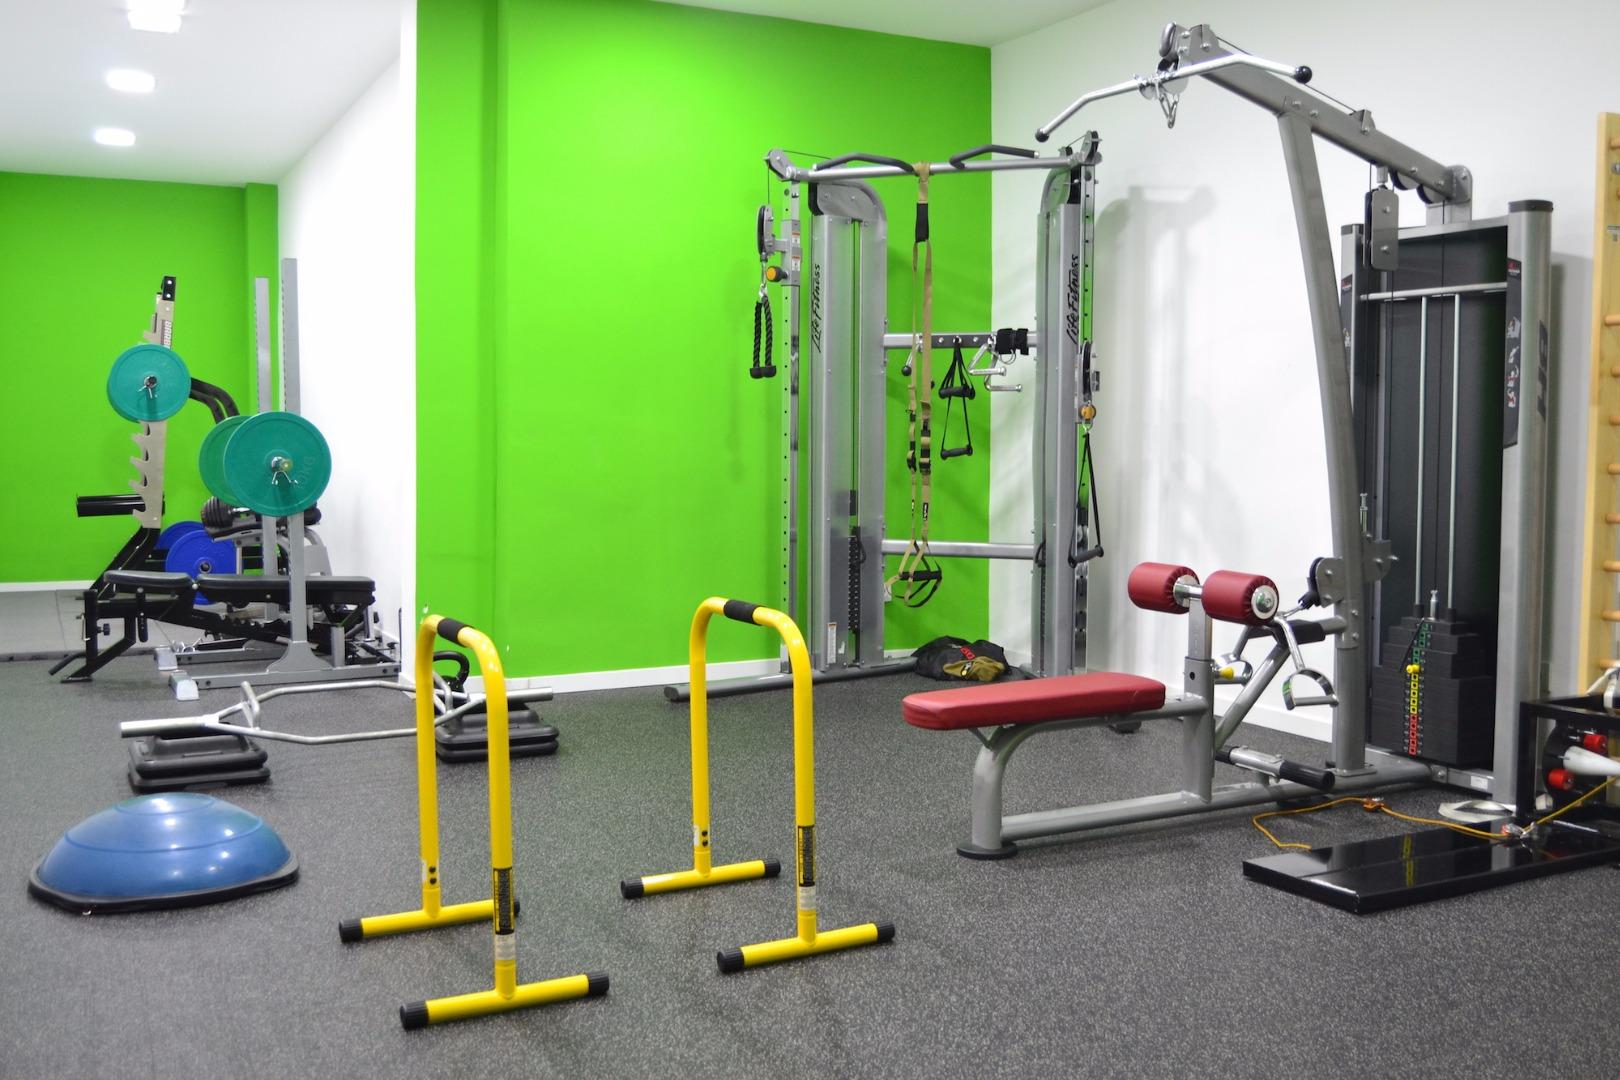 Oferta gimnasio body factory retiro sur madrid gymforless for Gimnasio 02 huelva